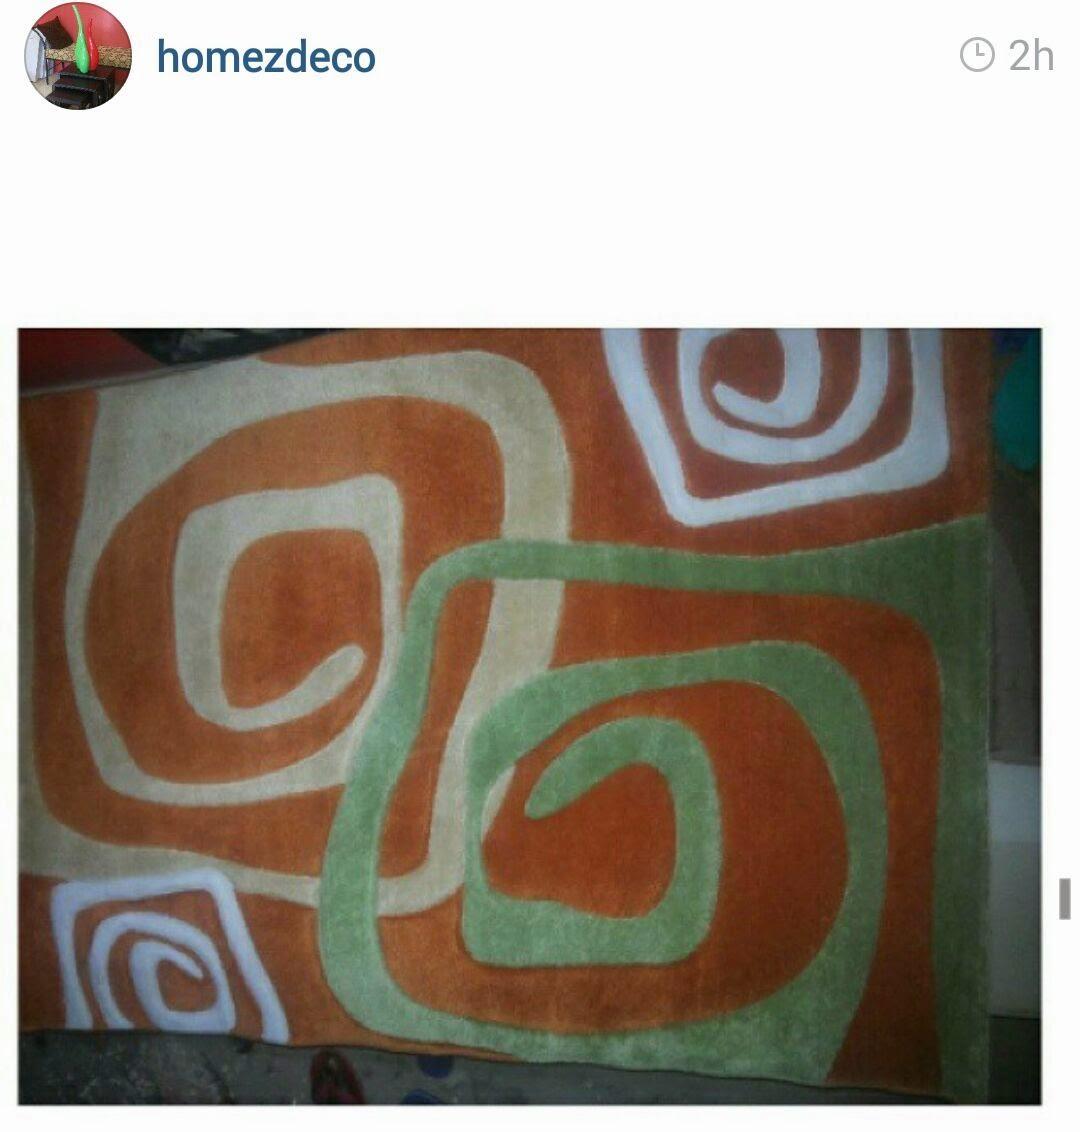 Homez Deco Kreative Homez October 2014 : IMG 20140920 WA0005 from homezdeco.blogspot.com size 1080 x 1132 jpeg 103kB